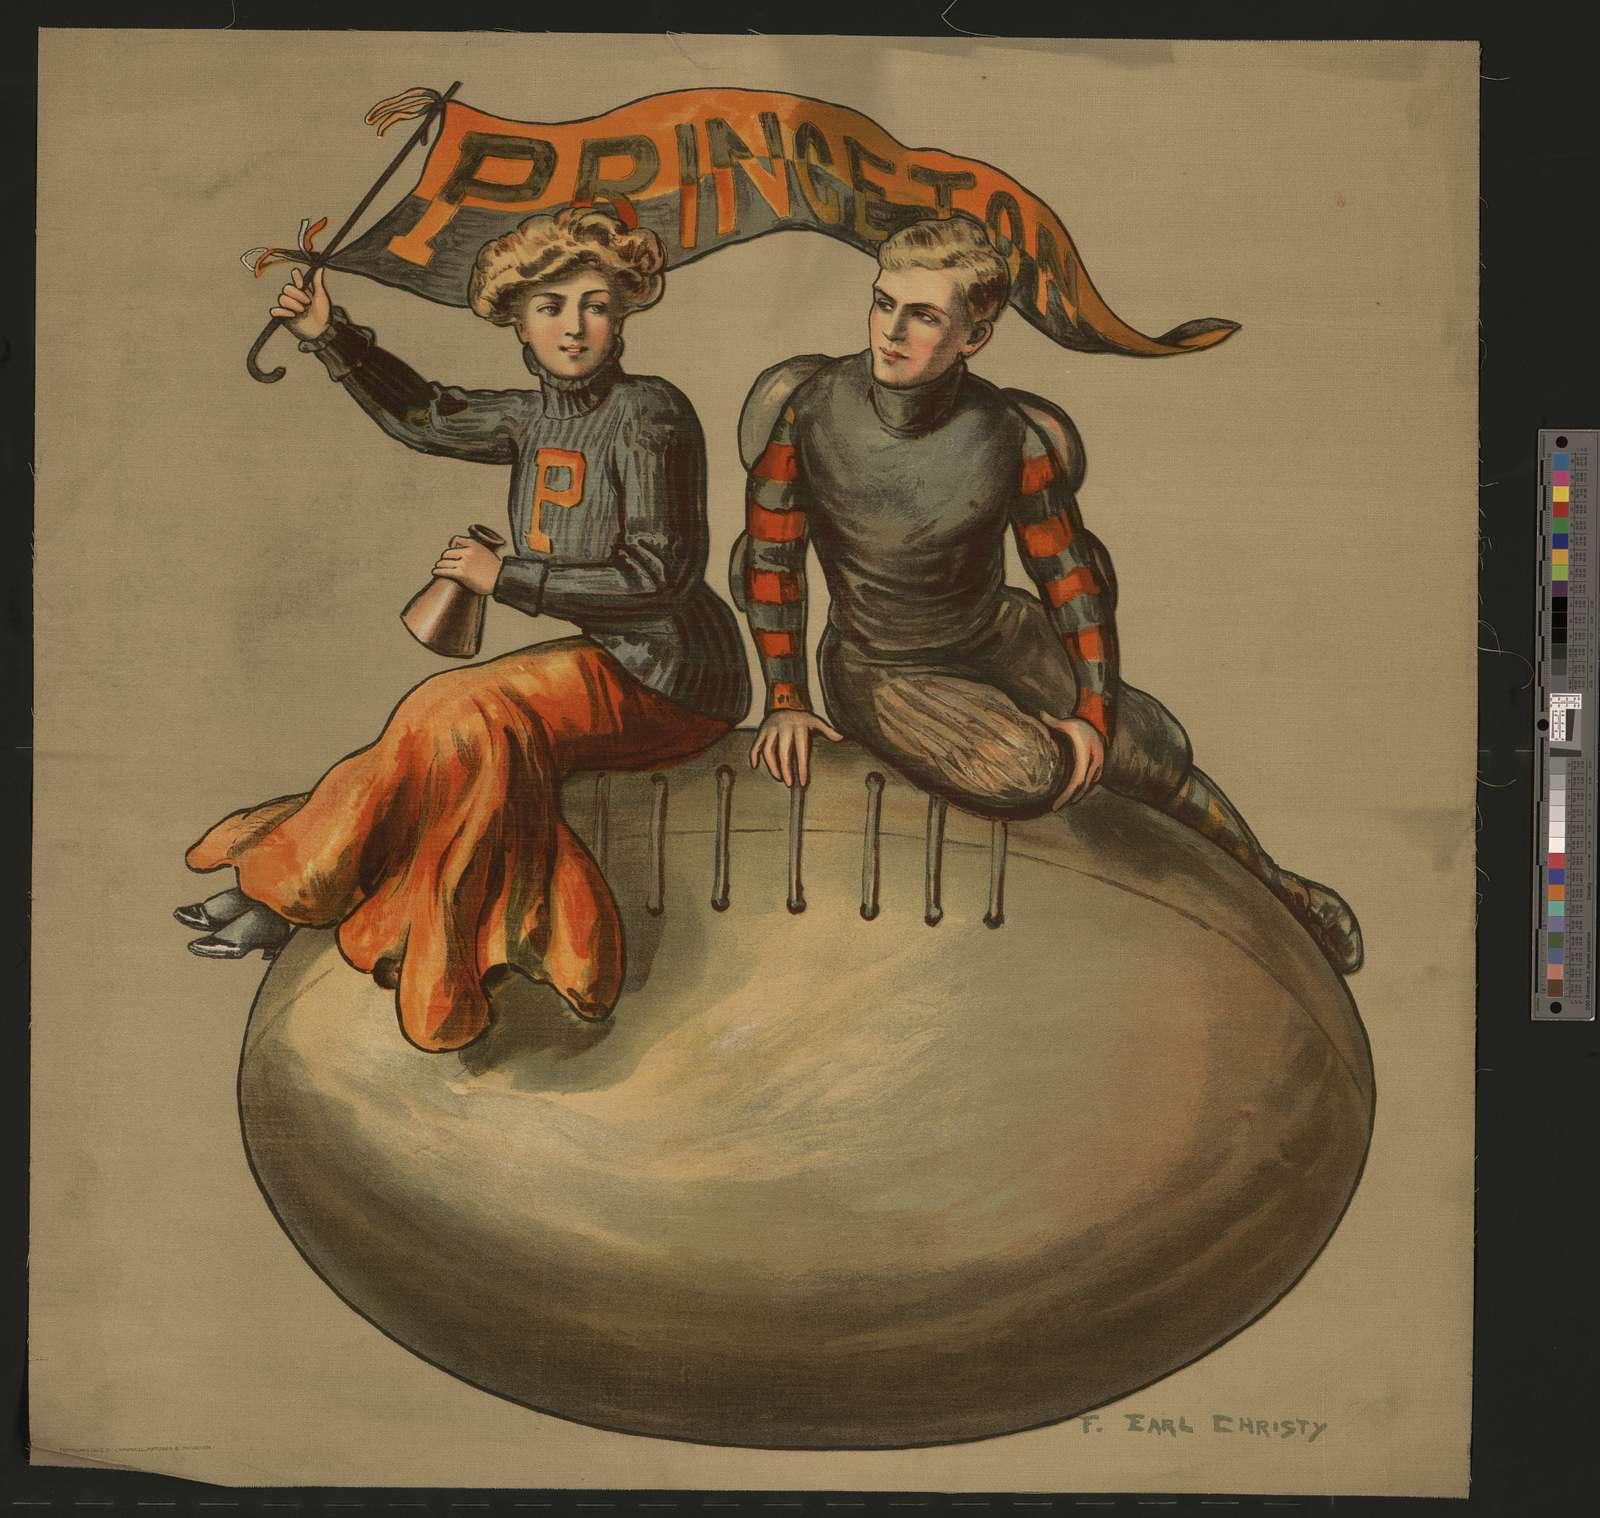 Princeton / F. Earl Christy.